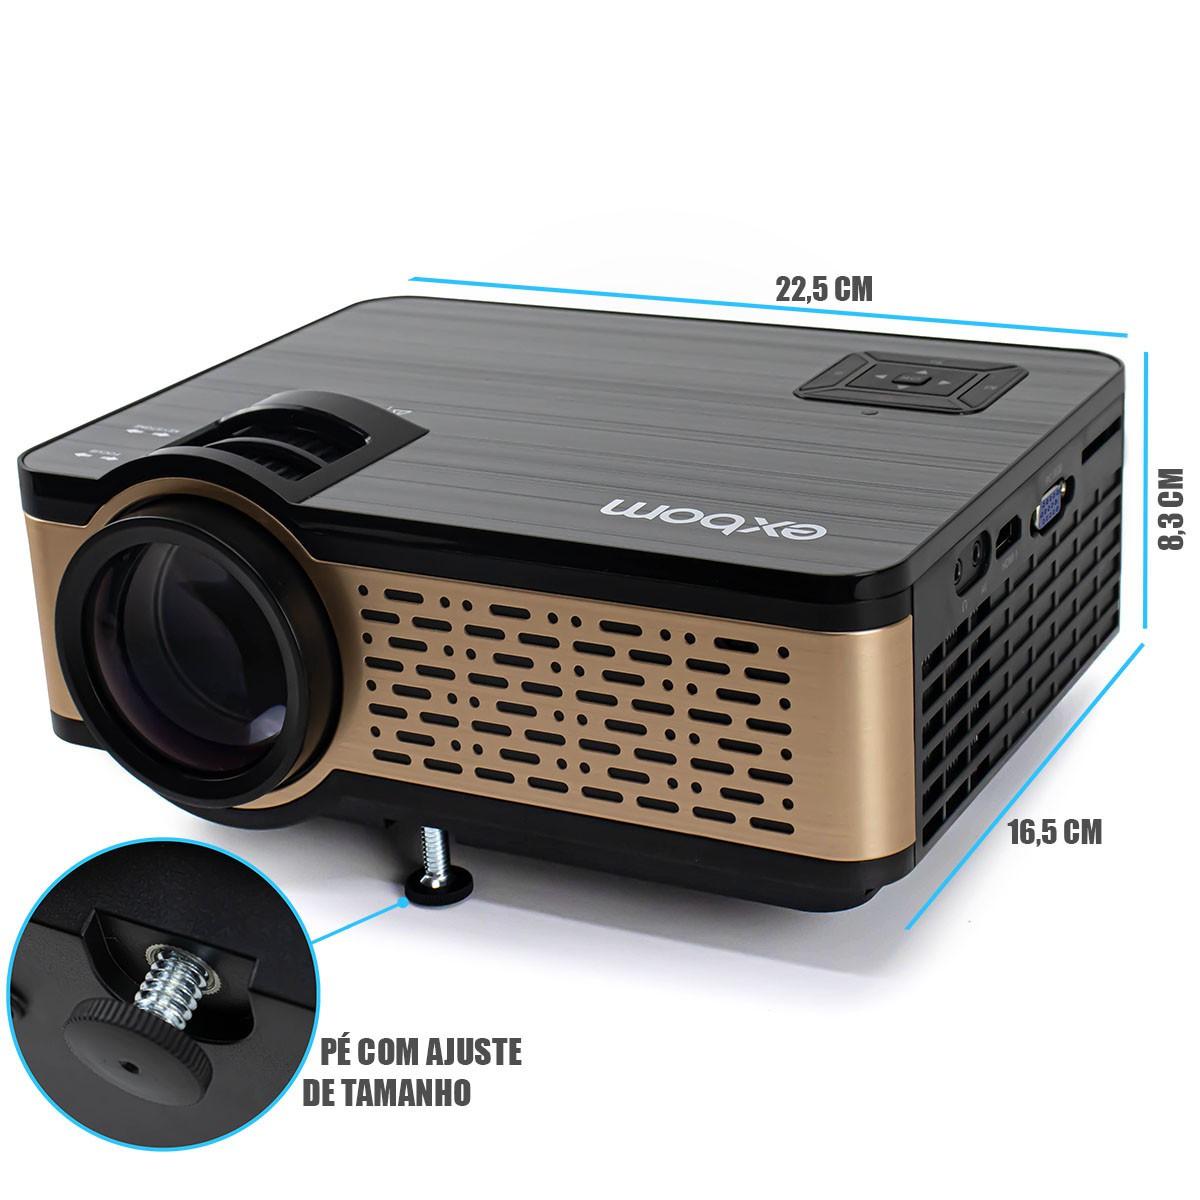 Smart Projetor LED 1600 Lúmens Multimídia Full HD 1080p Com Bluetooth Android Wi-fi Exbom PJ-S300